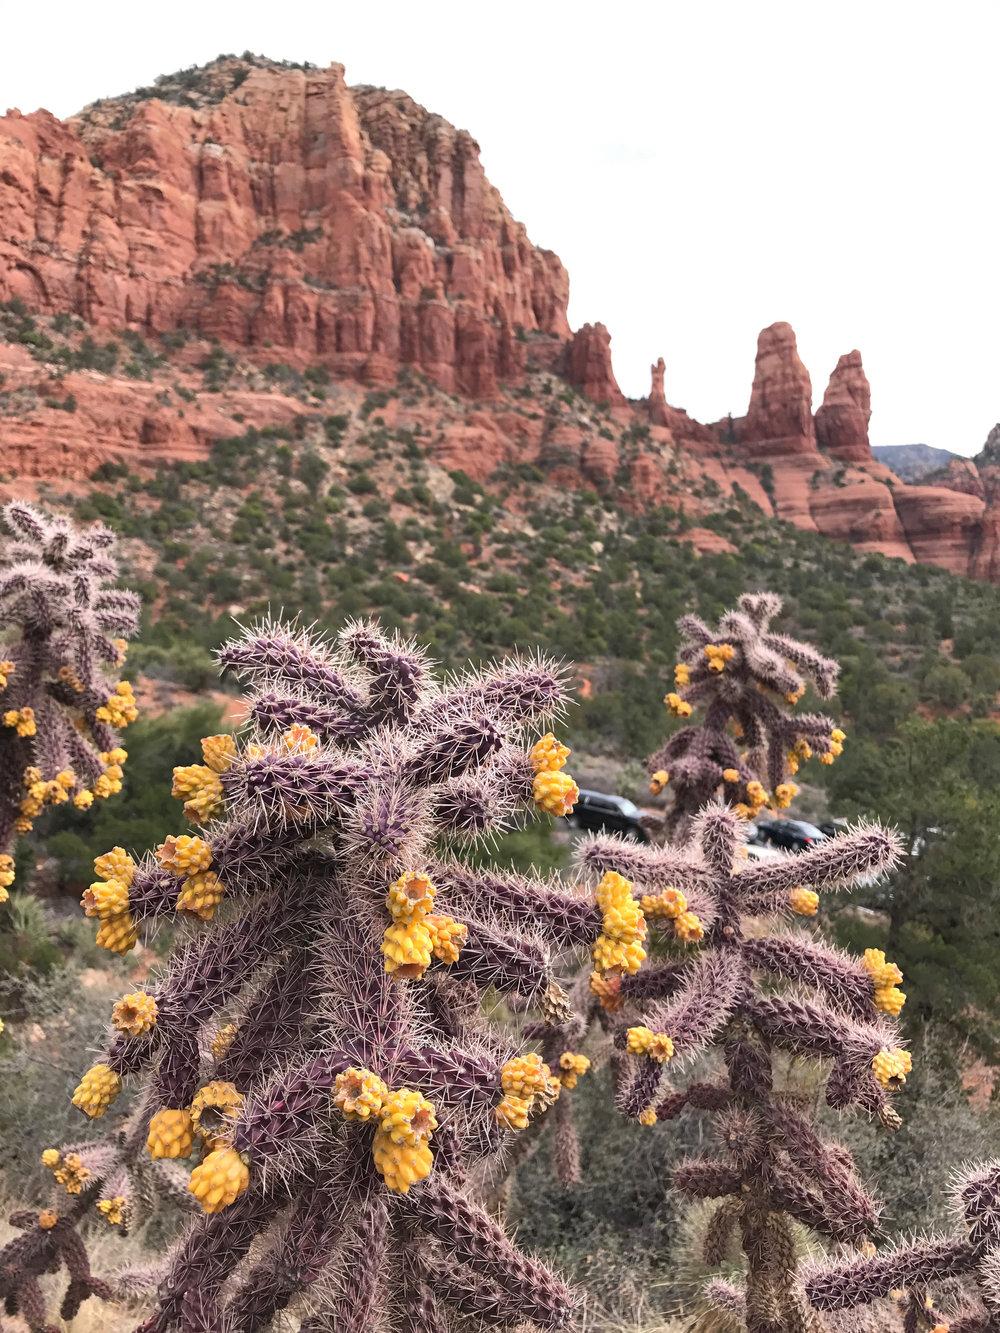 Beyond Ordinary Guides' Guide to Sedona, Arizona-115.jpg